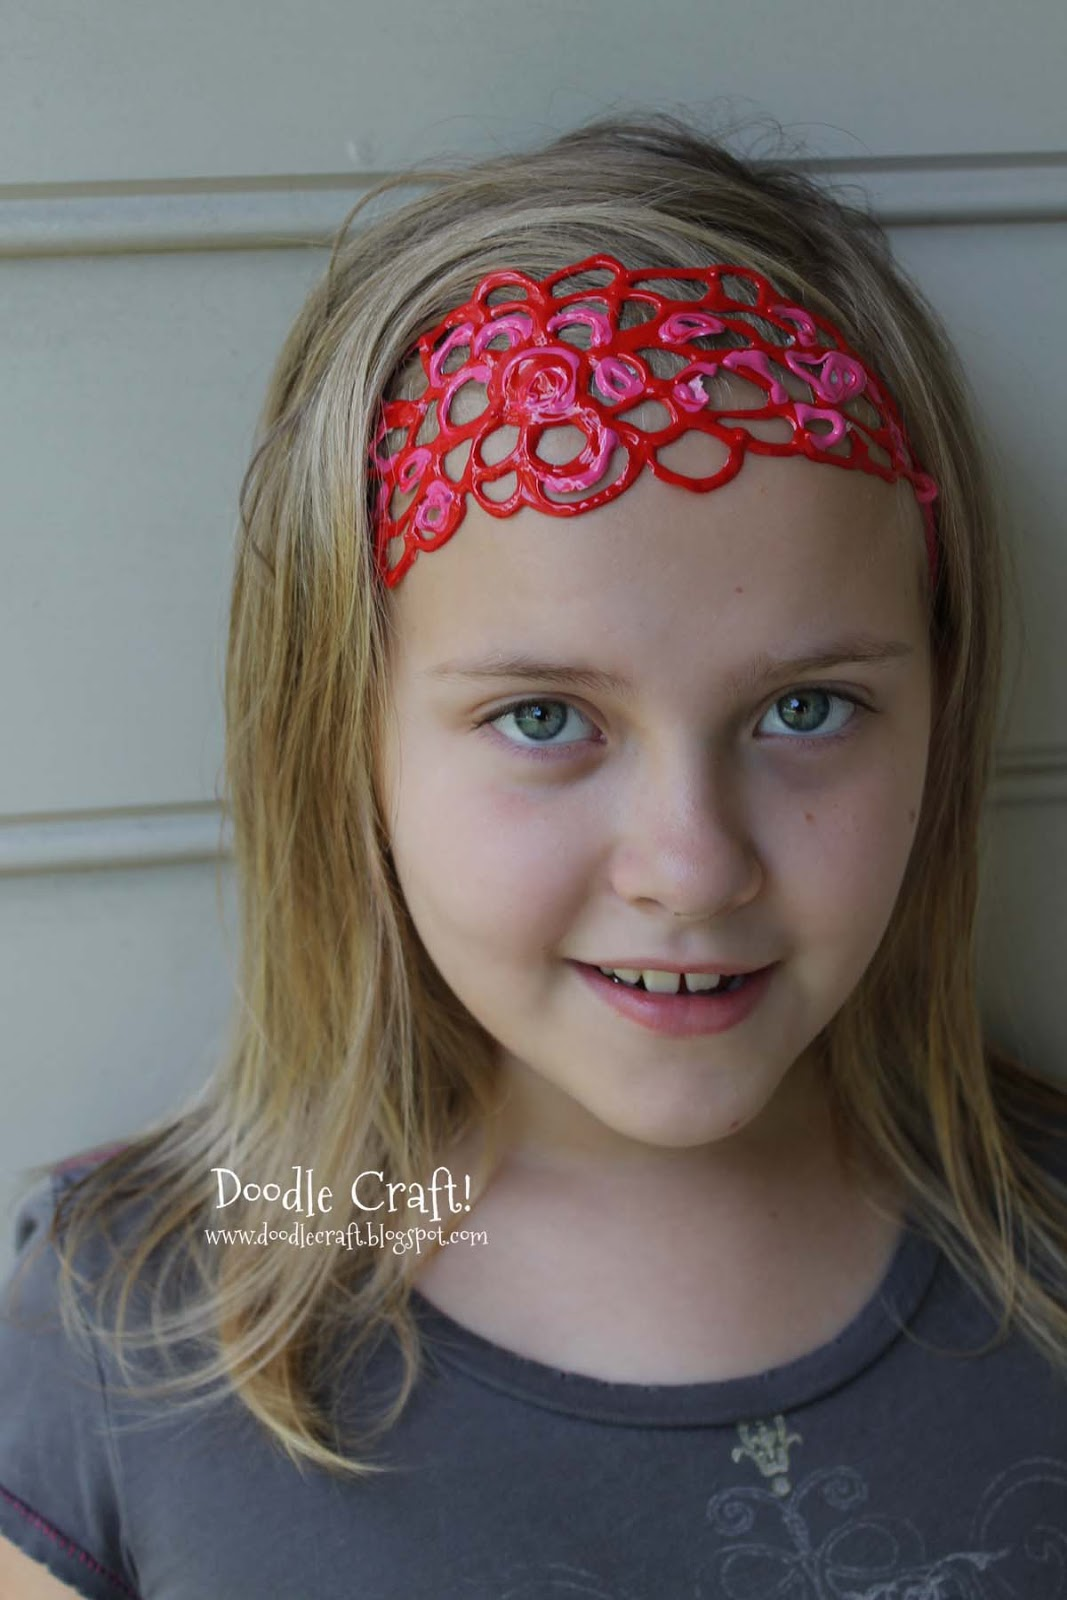 Puffy Paint Bracelets Wristbands and Headbands!